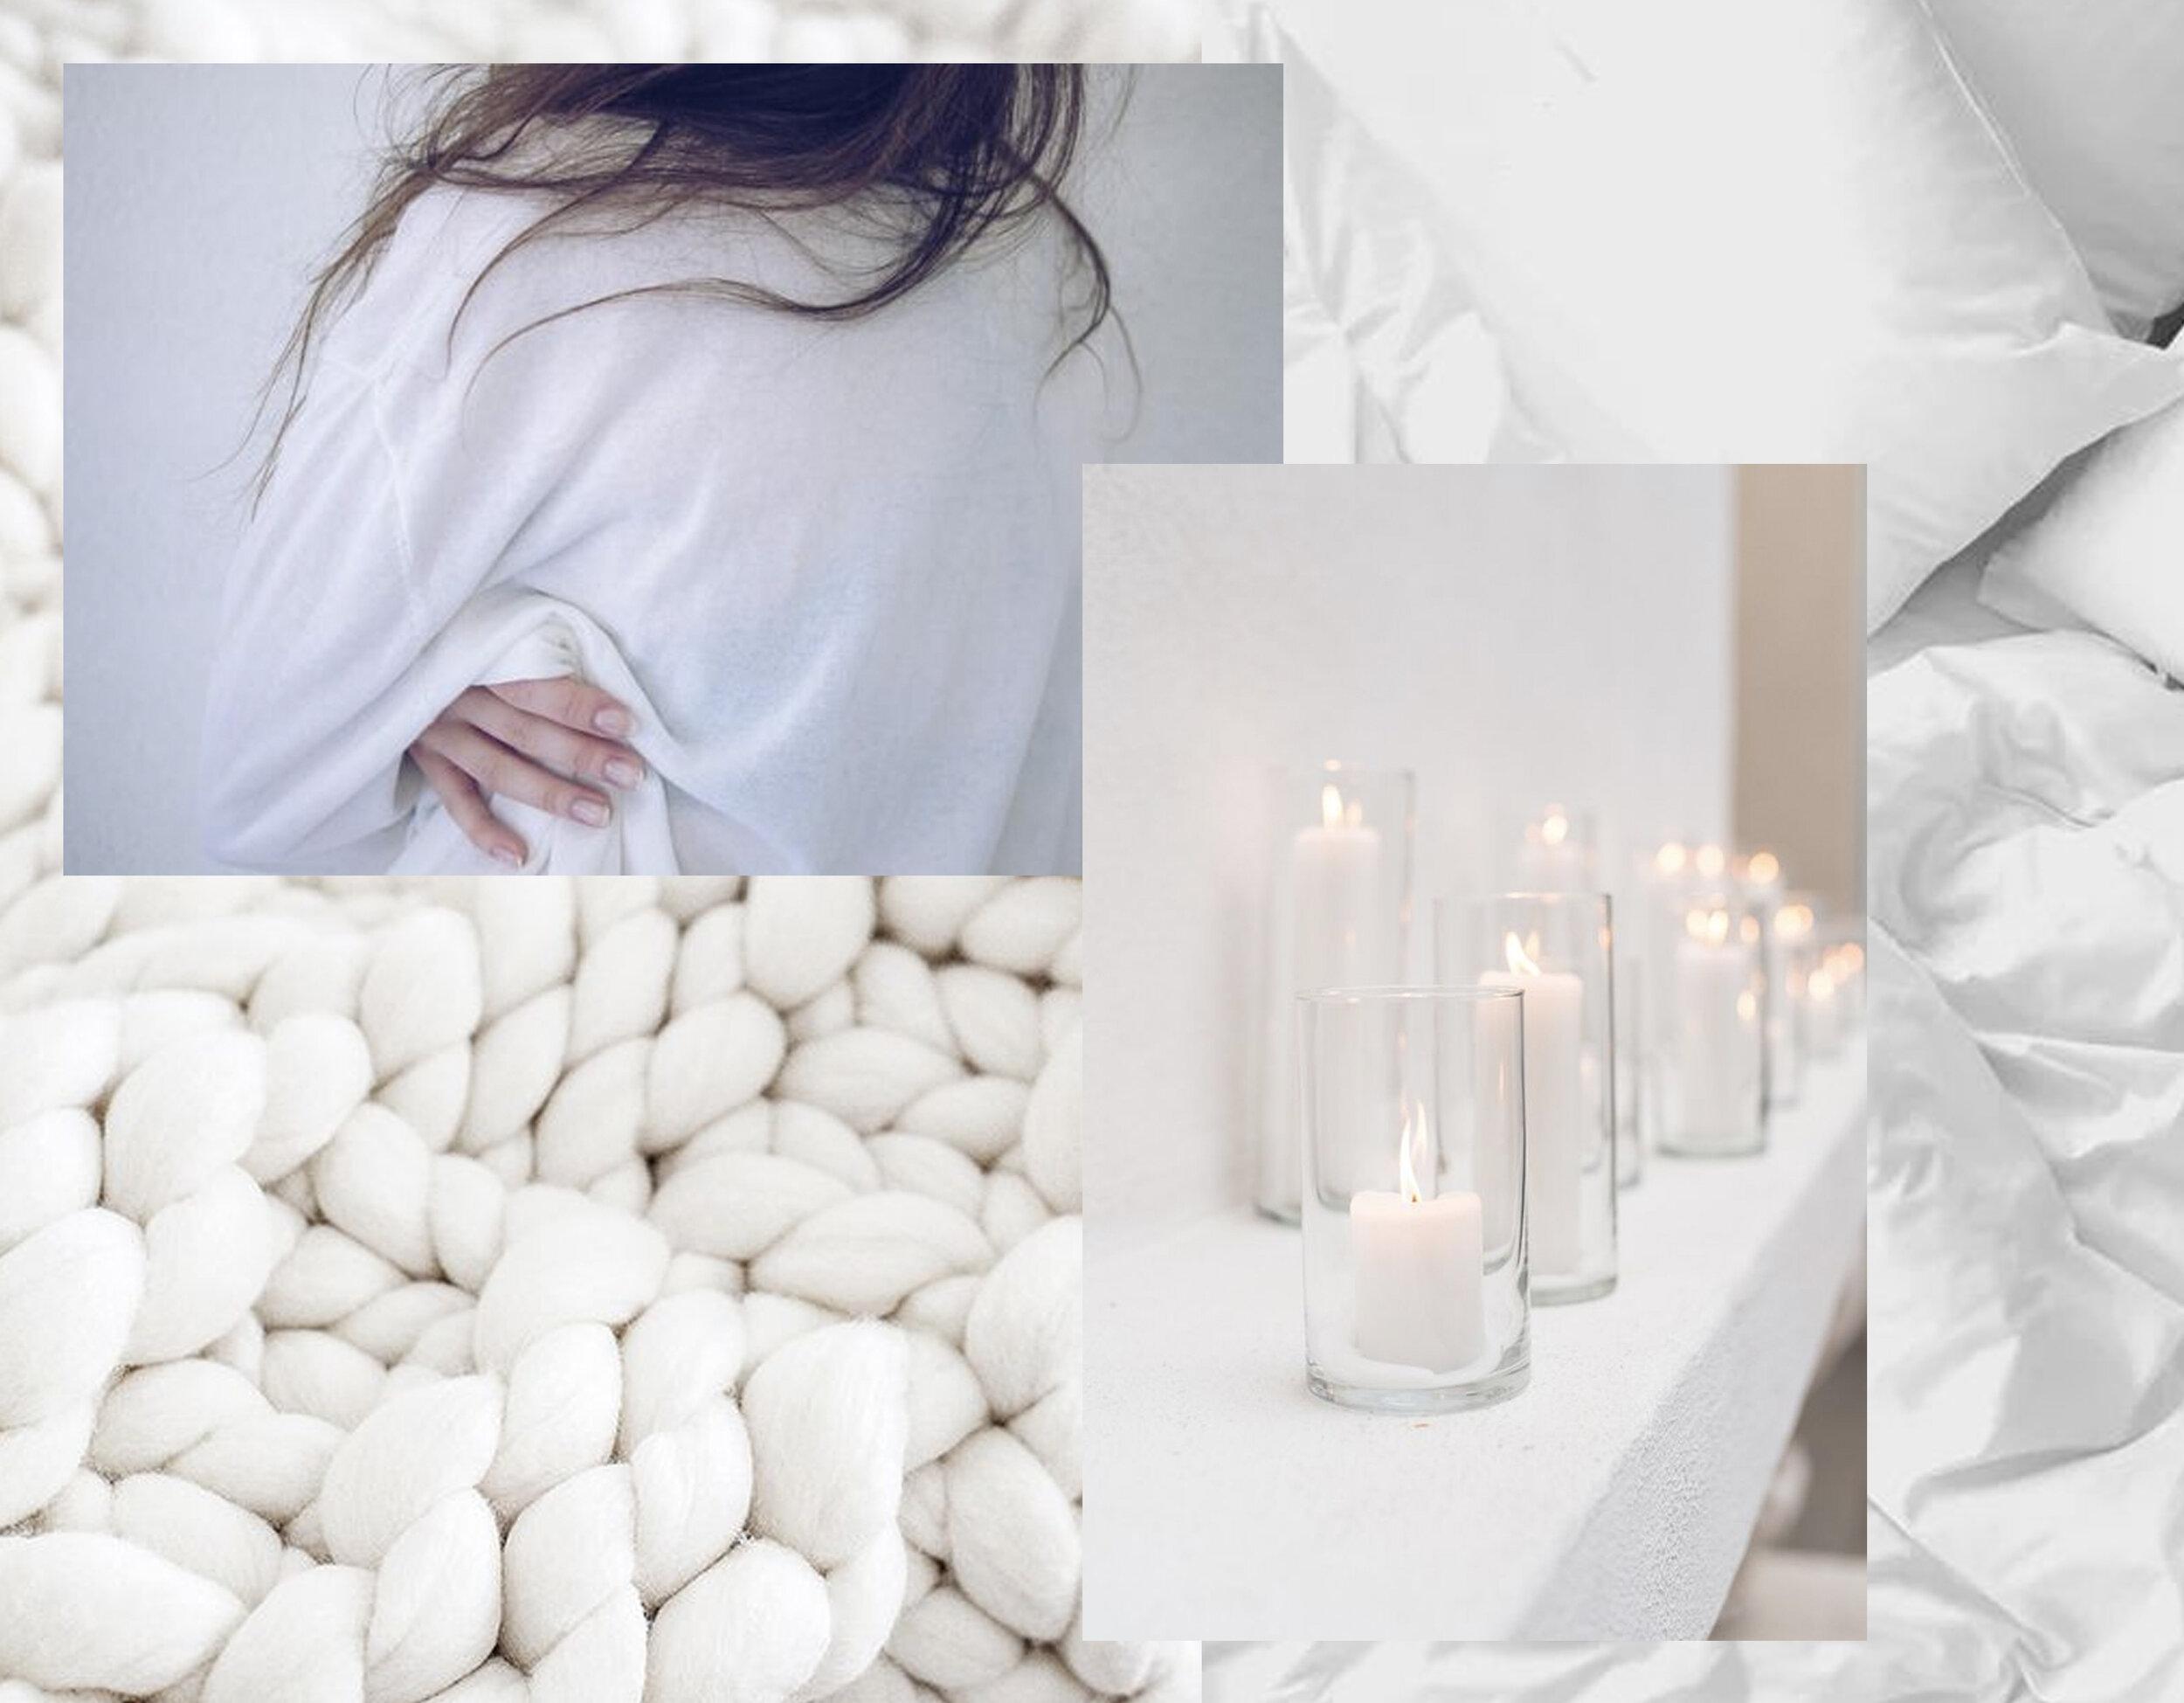 knitted wool via  Kara Rosenlund  - image woman Darian Nepriakhina via  Unsplash  - candles - bedlinnen Sylvie Tittel via  Unsplash